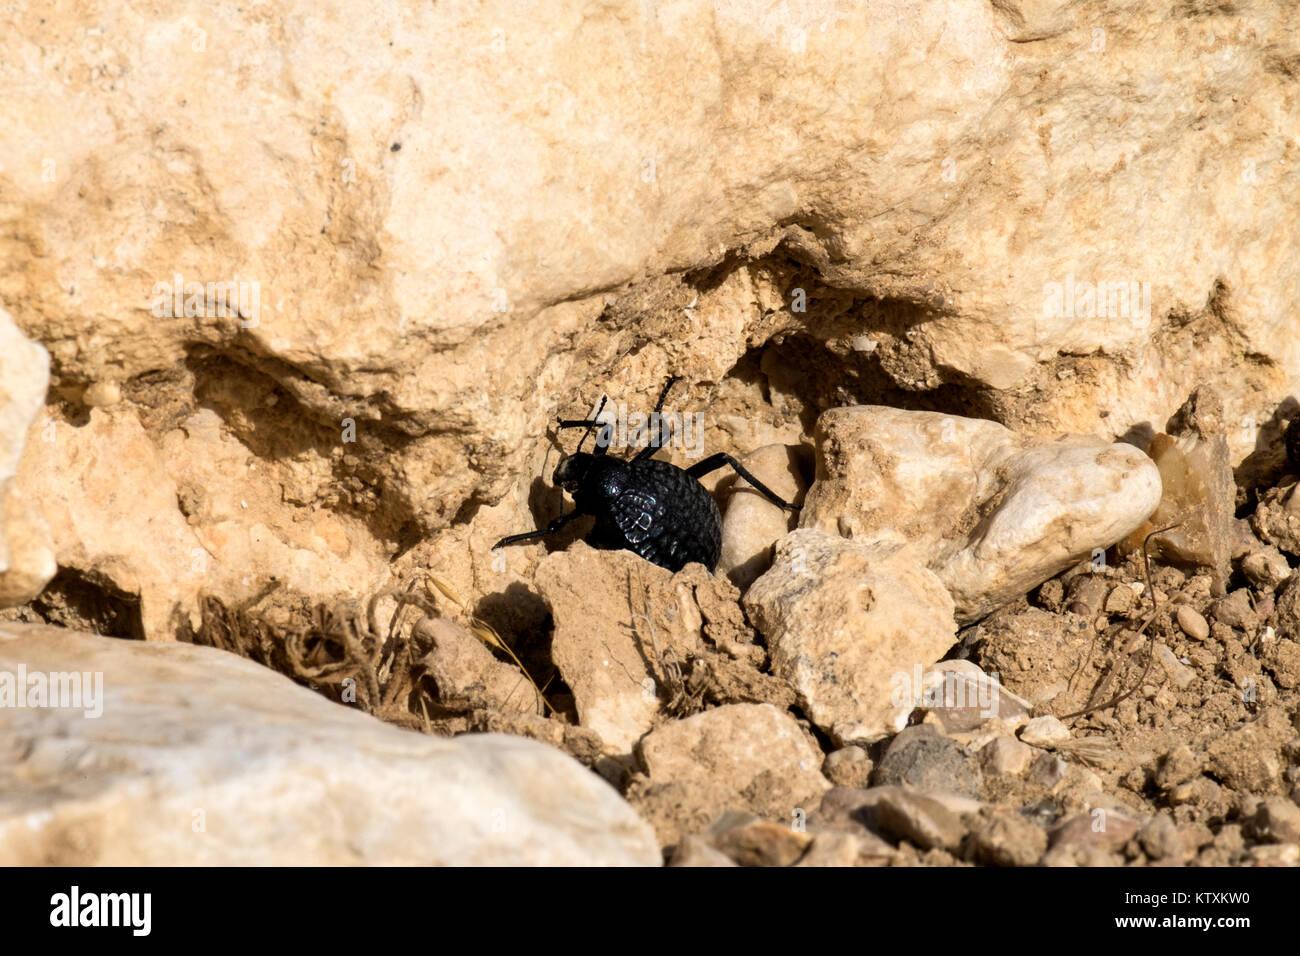 Beetle from the family of darkling beetles sits between stones (Pimelia bipunctata) - Stock Image